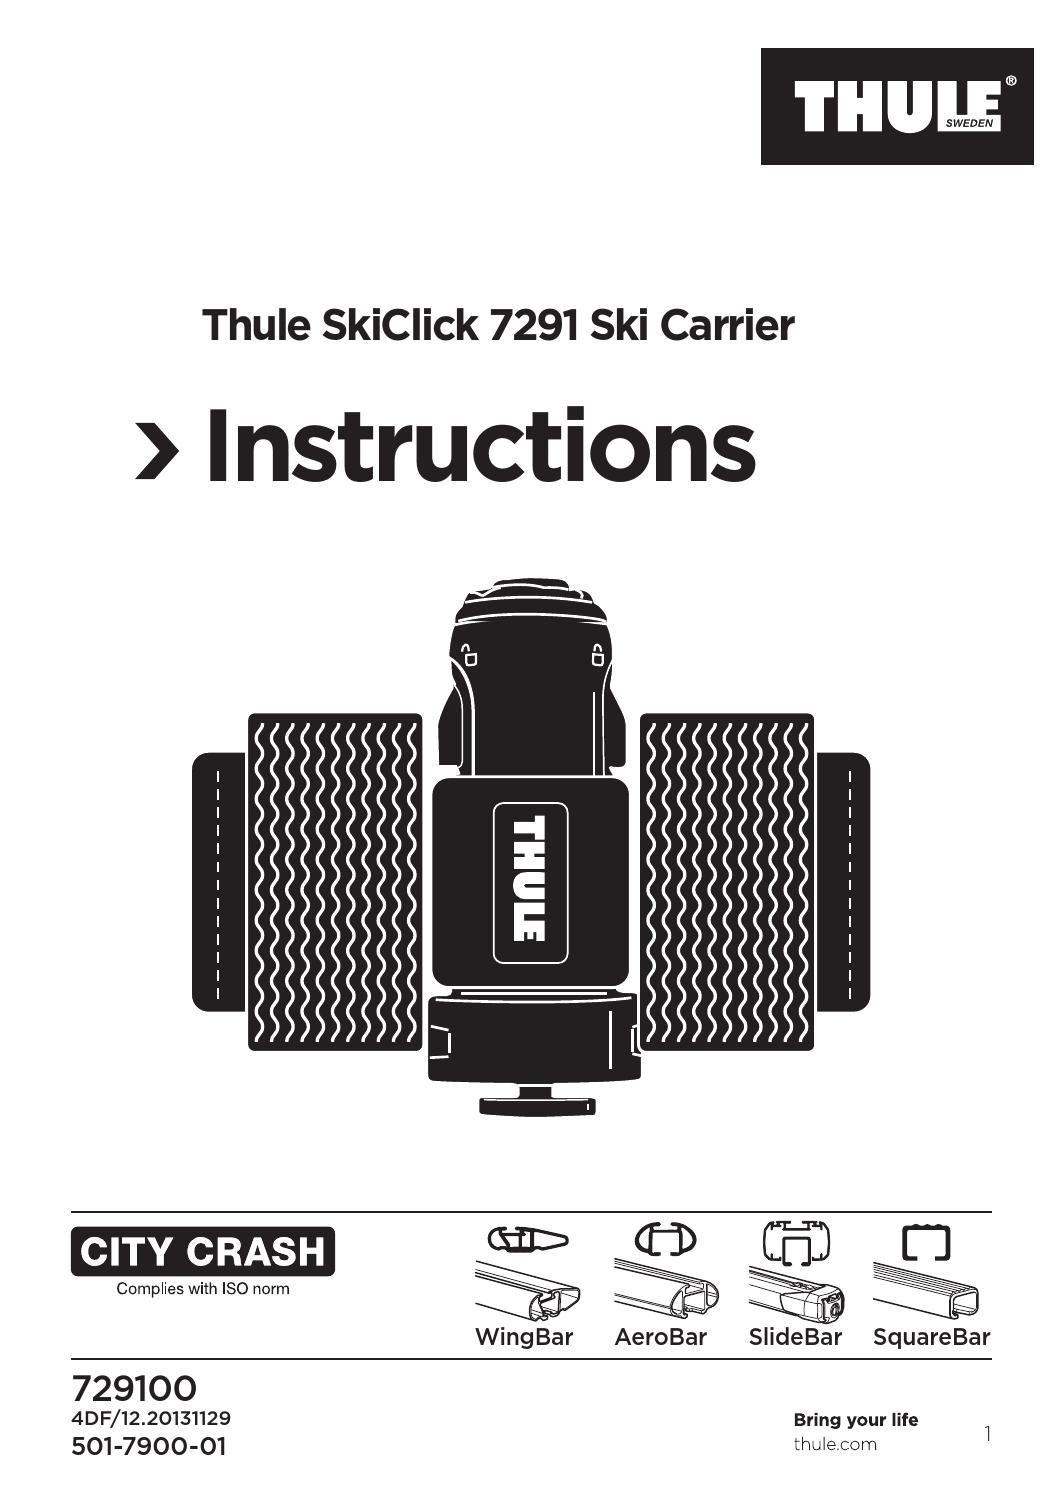 Thule 729100 SkiClick